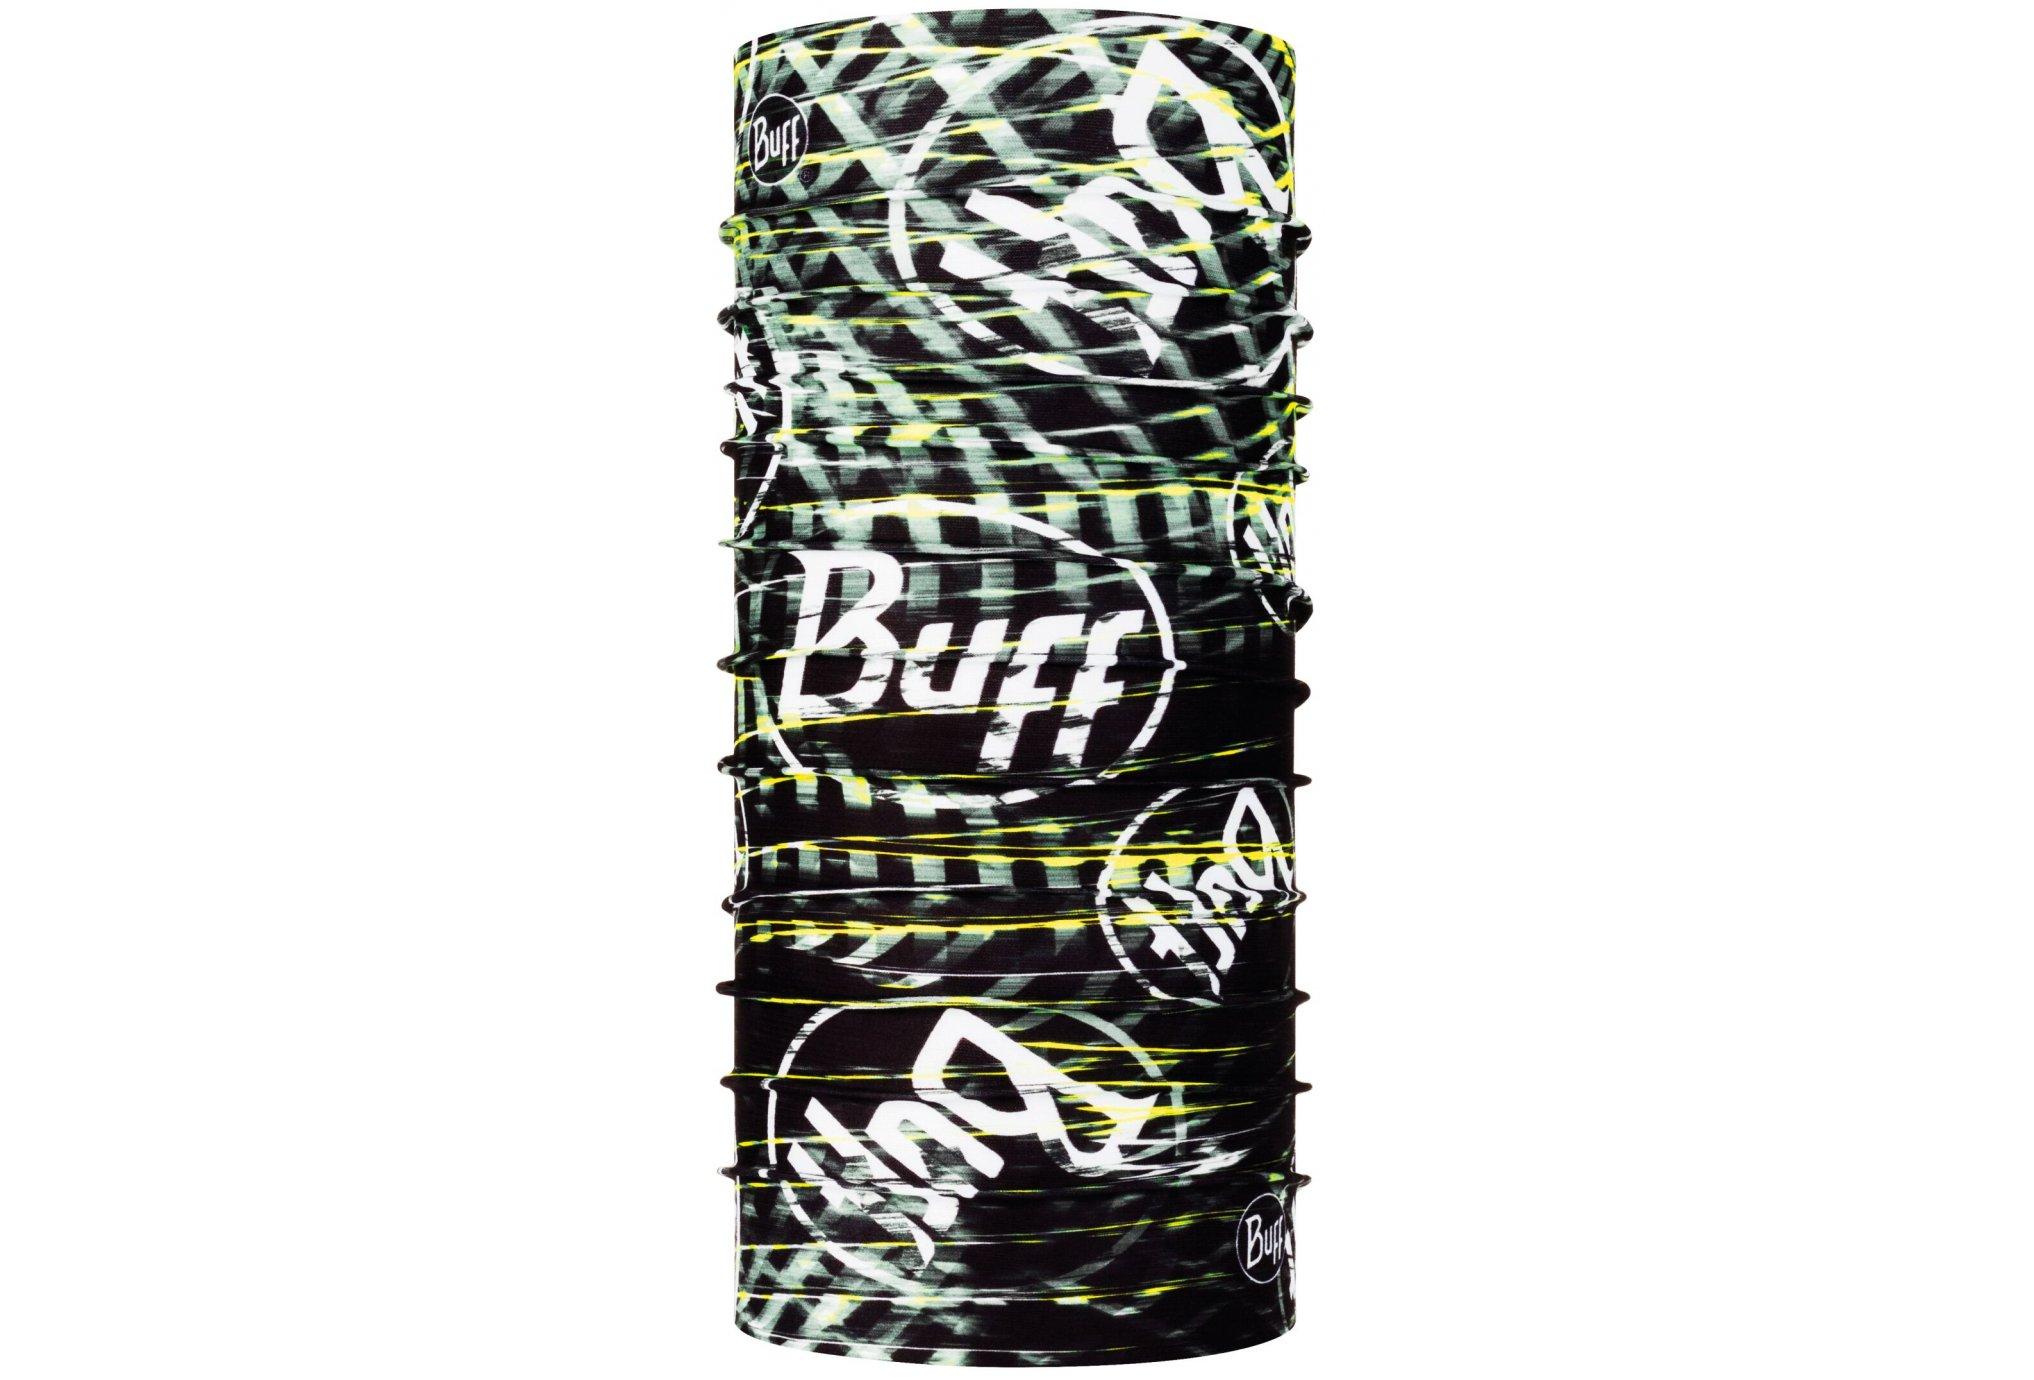 Buff Coolnet UV+ Ulnar Black Tours de cou